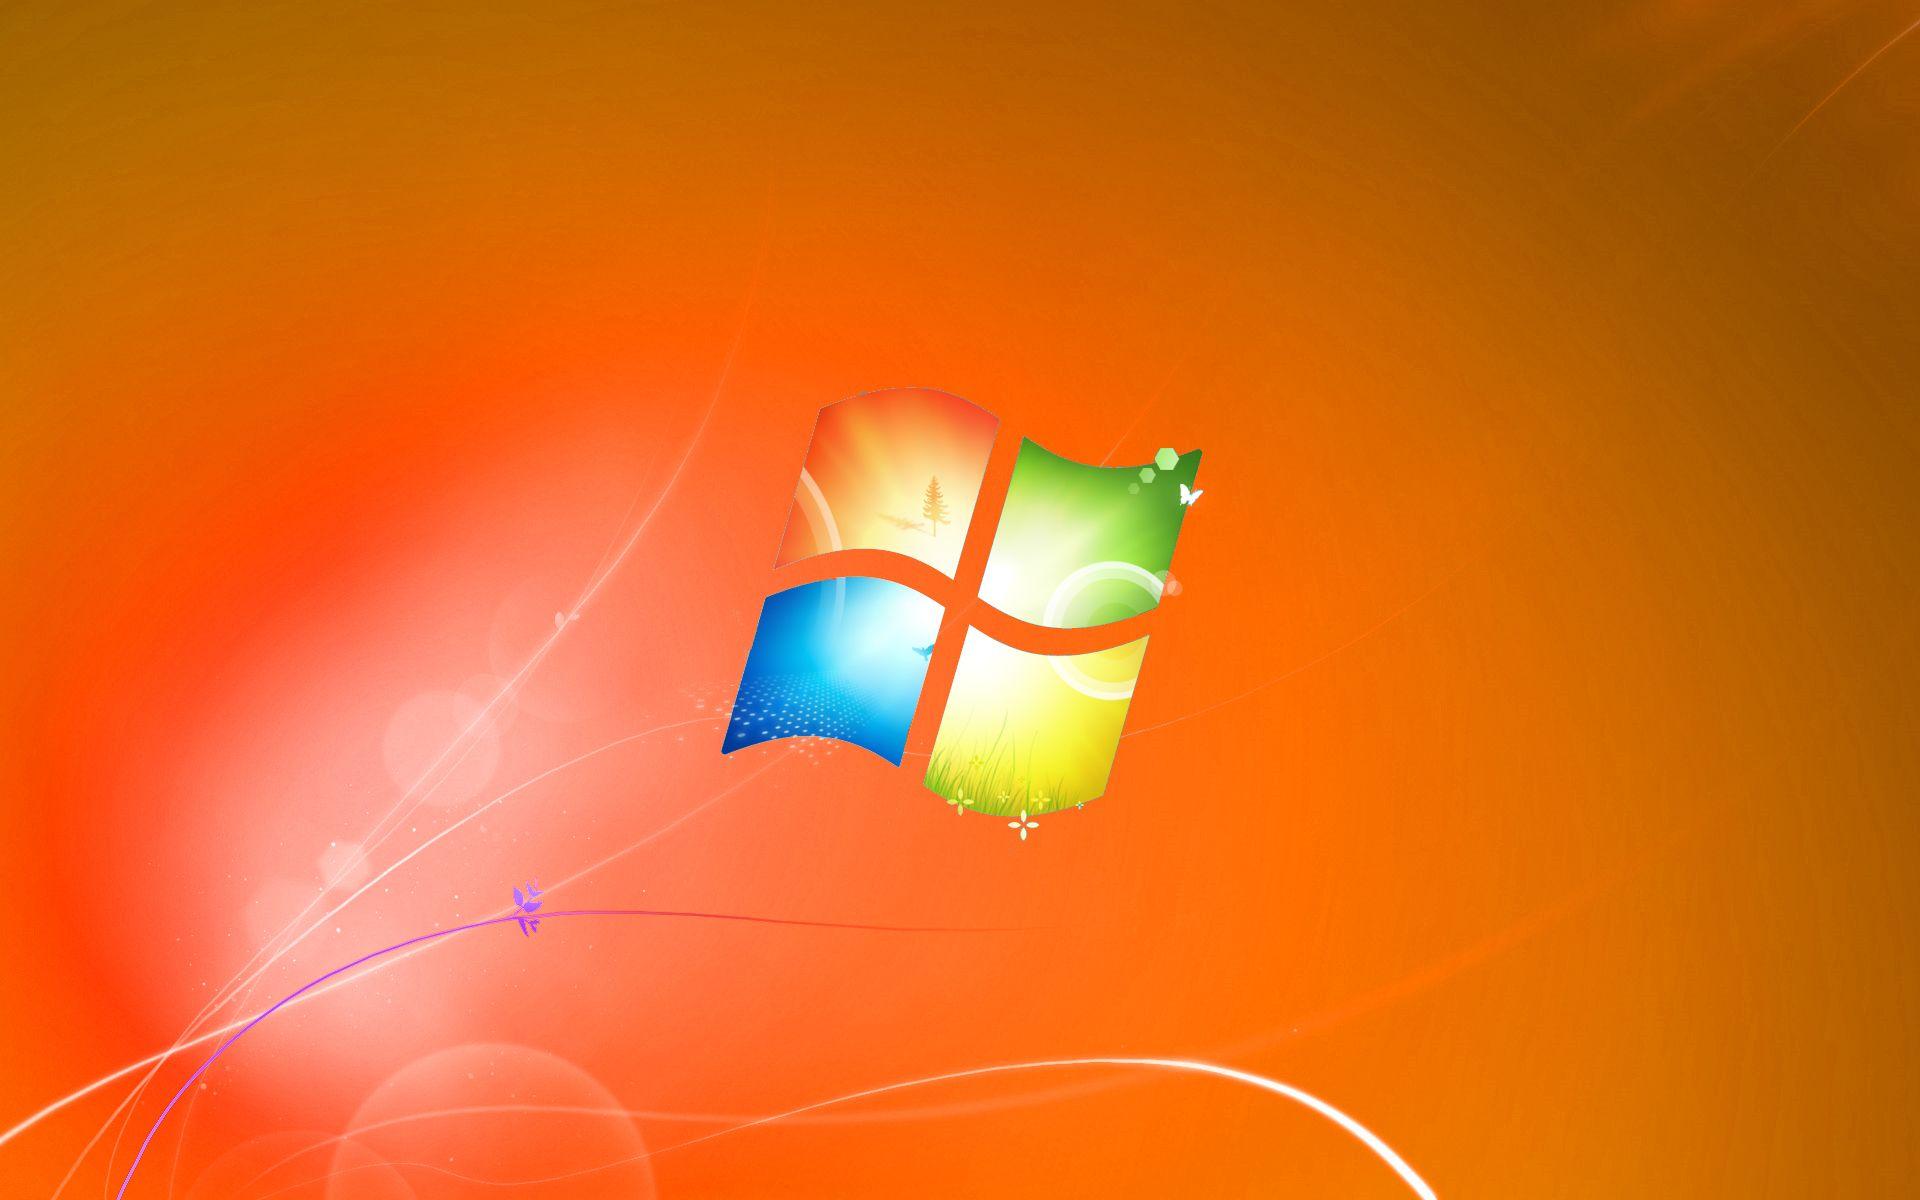 windows 7 default wallpaper orange versiondominichulme